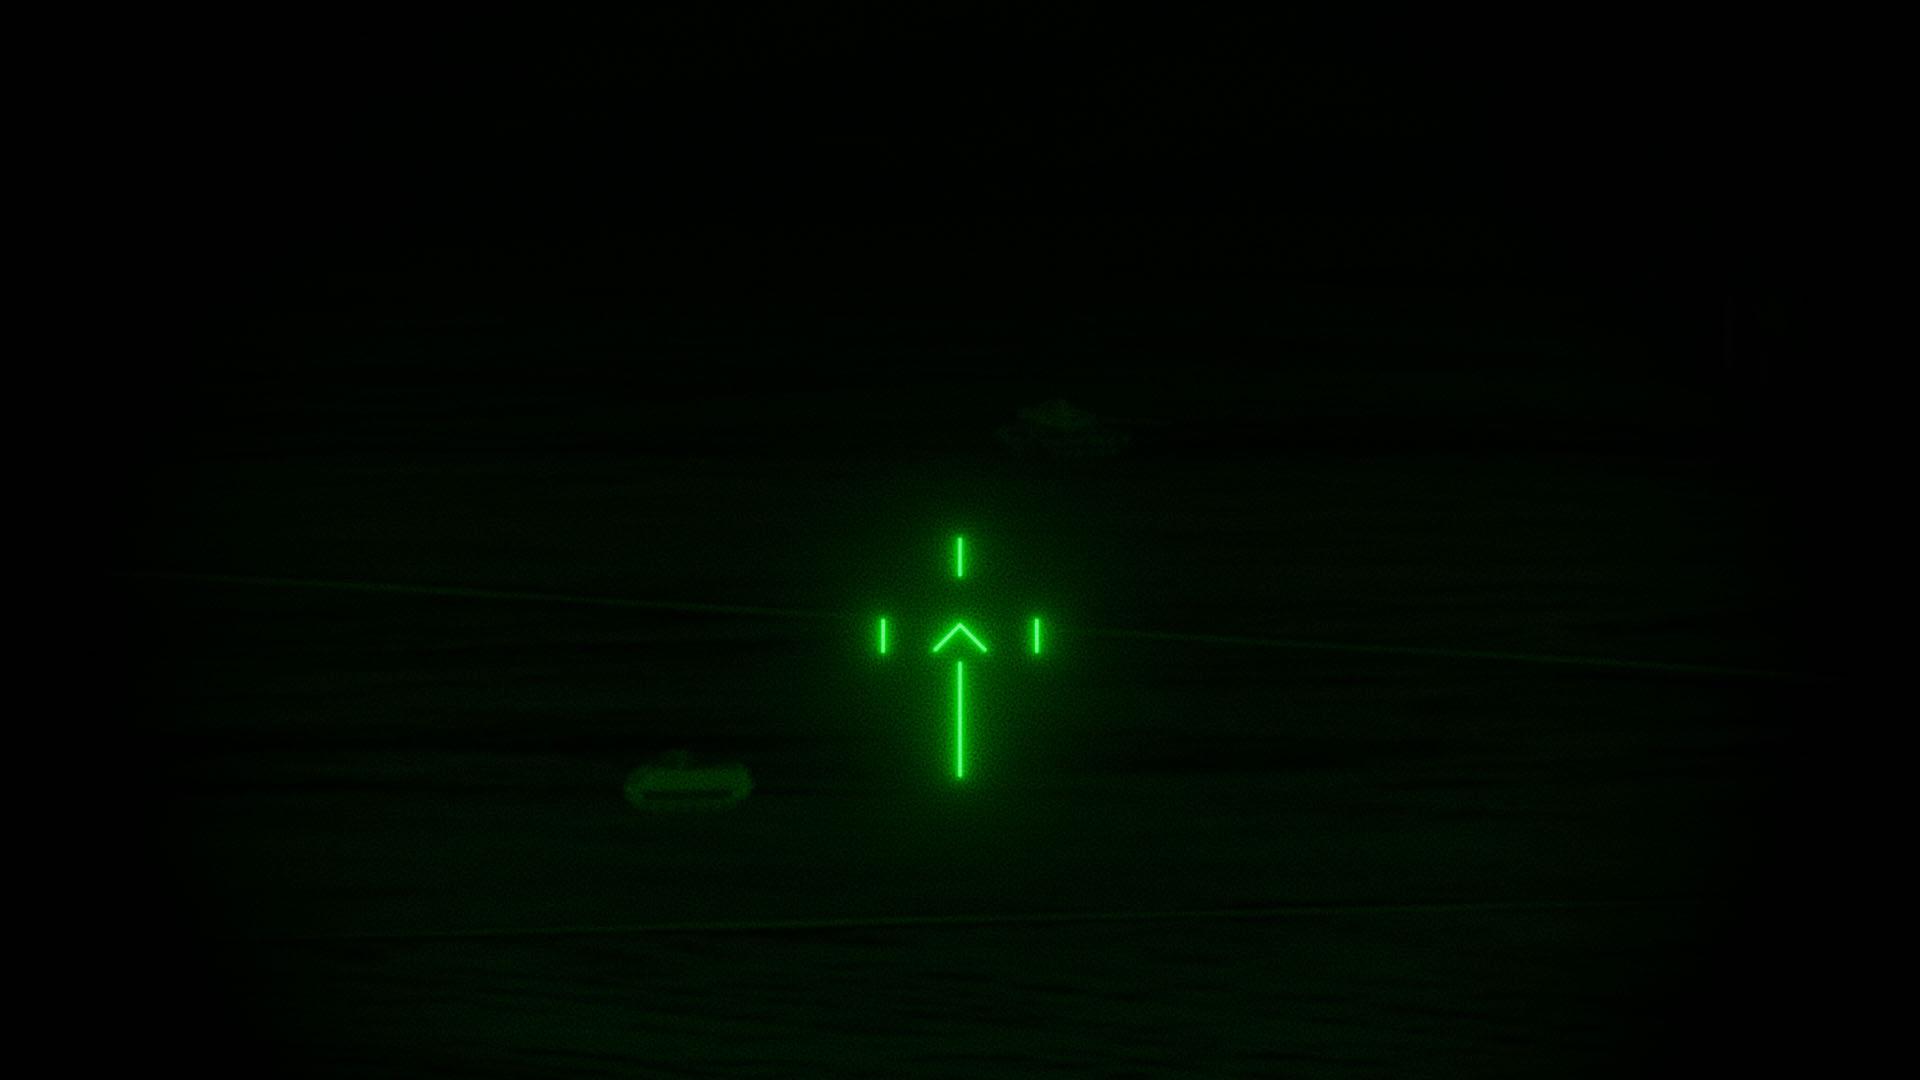 Targets observed with Luna 2